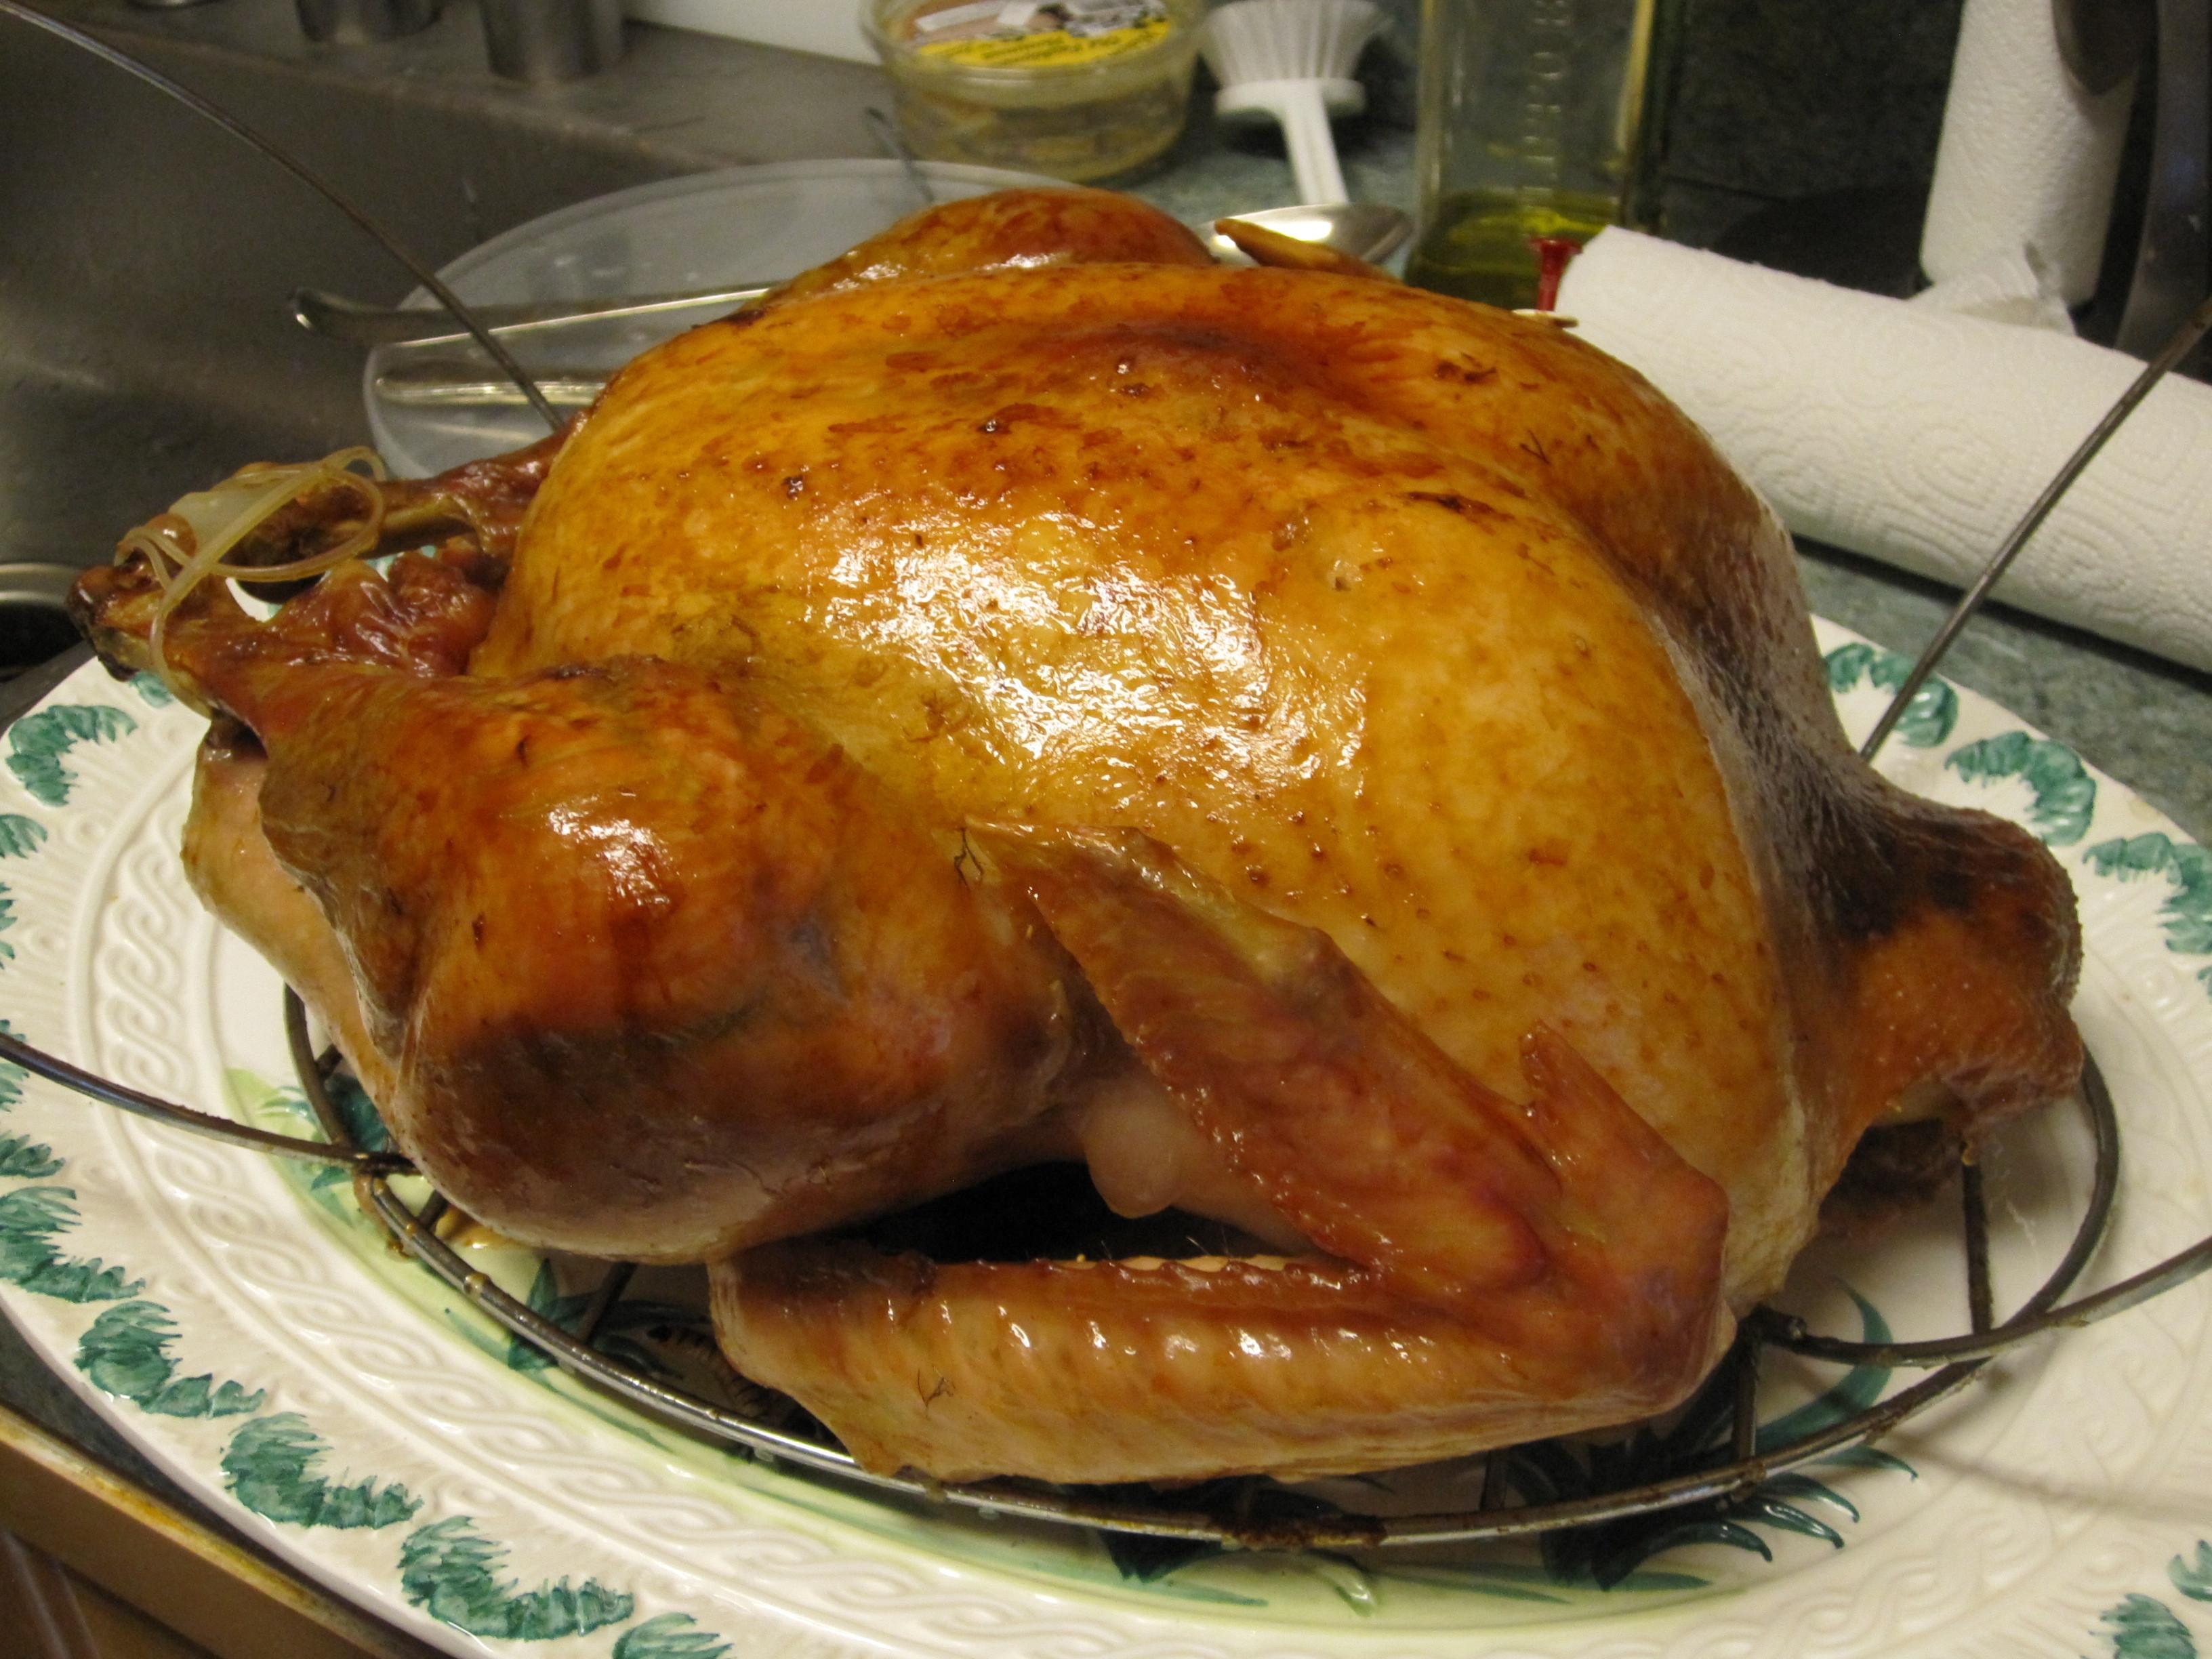 Prepared Turkey For Thanksgiving  Turkeytopia How I Produced a Thanksgiving Turkey Dinner